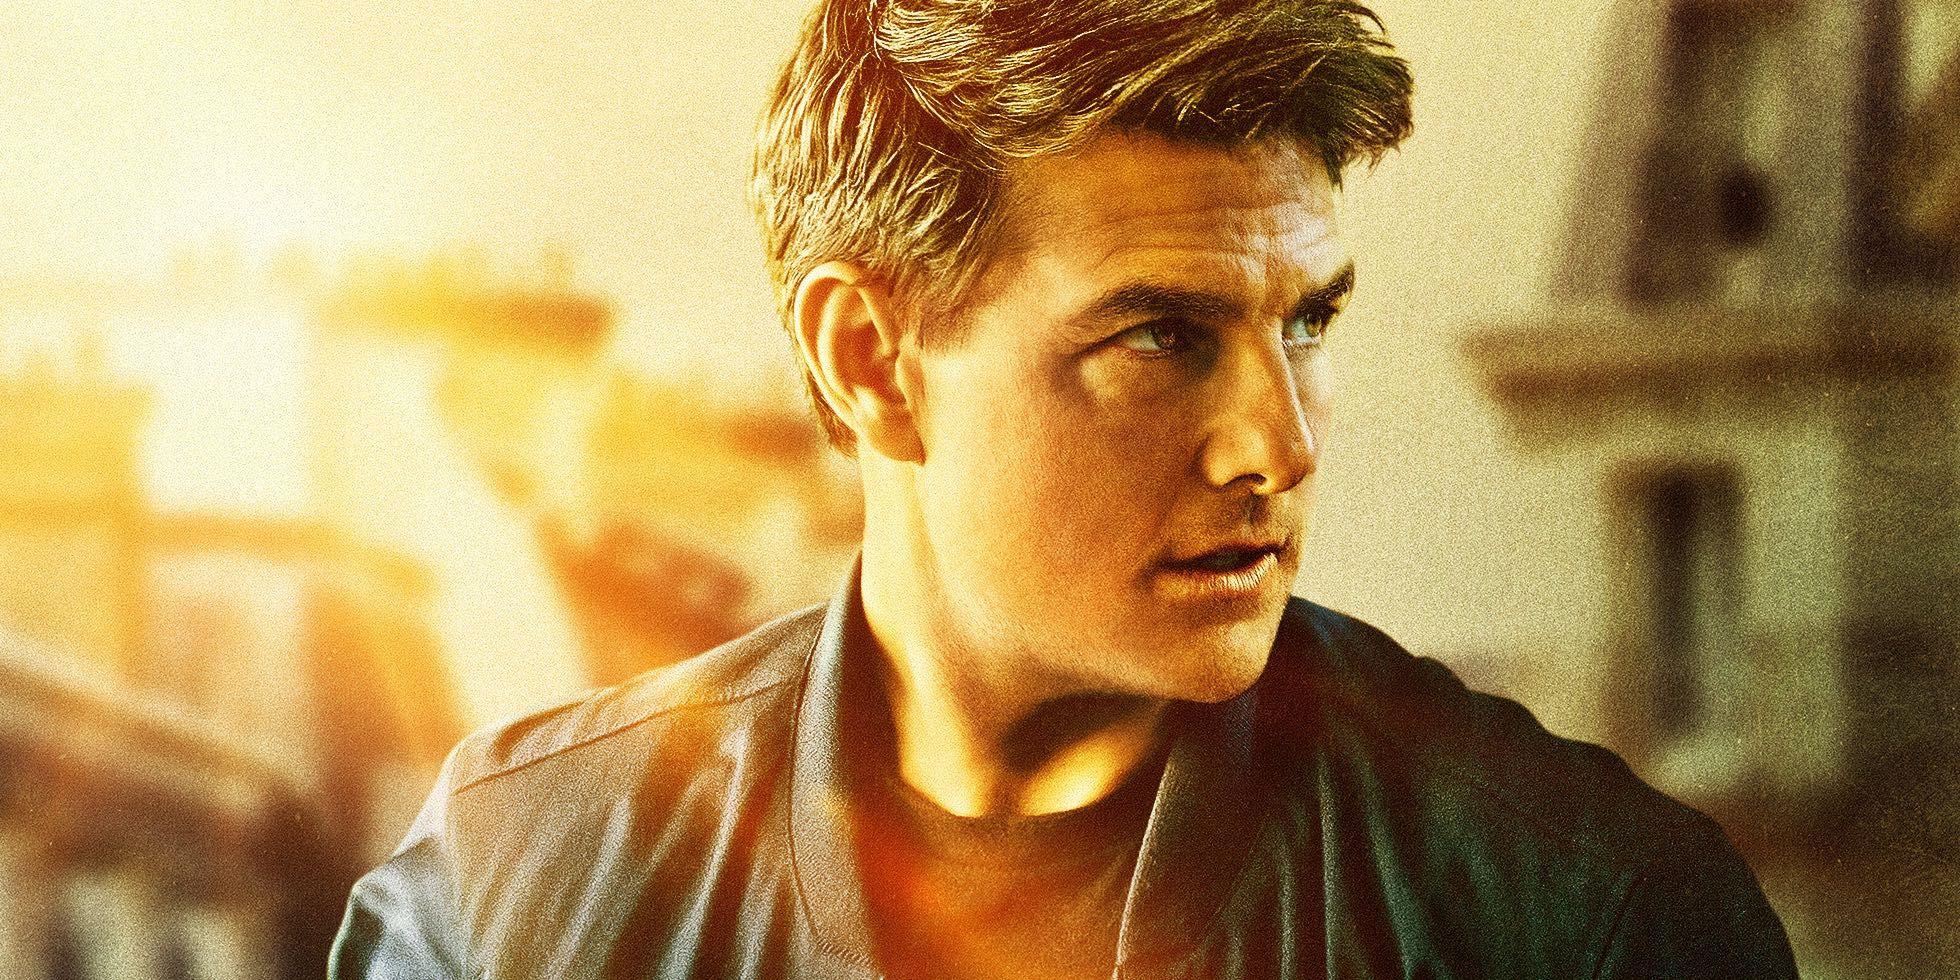 Tom Cruise Filmy